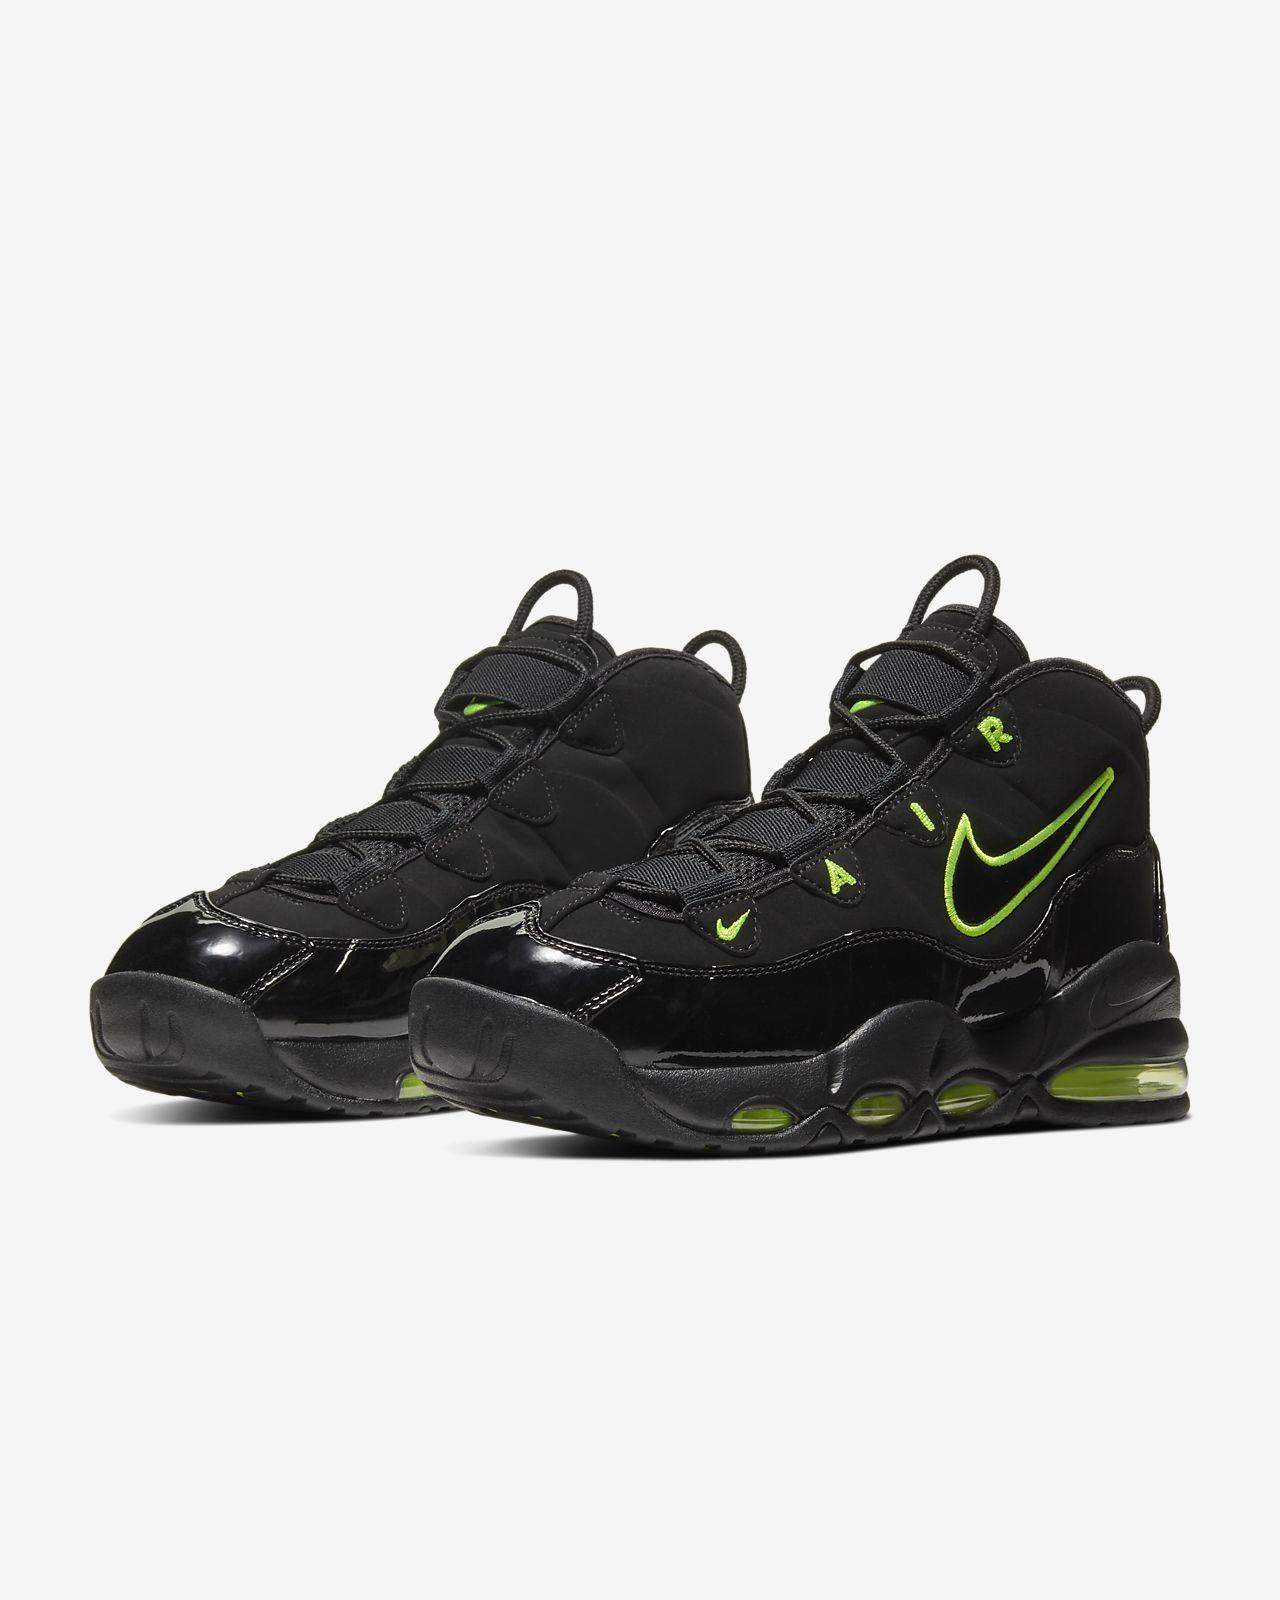 Sapatilhas Nike Air Max Uptempo '95 para homem